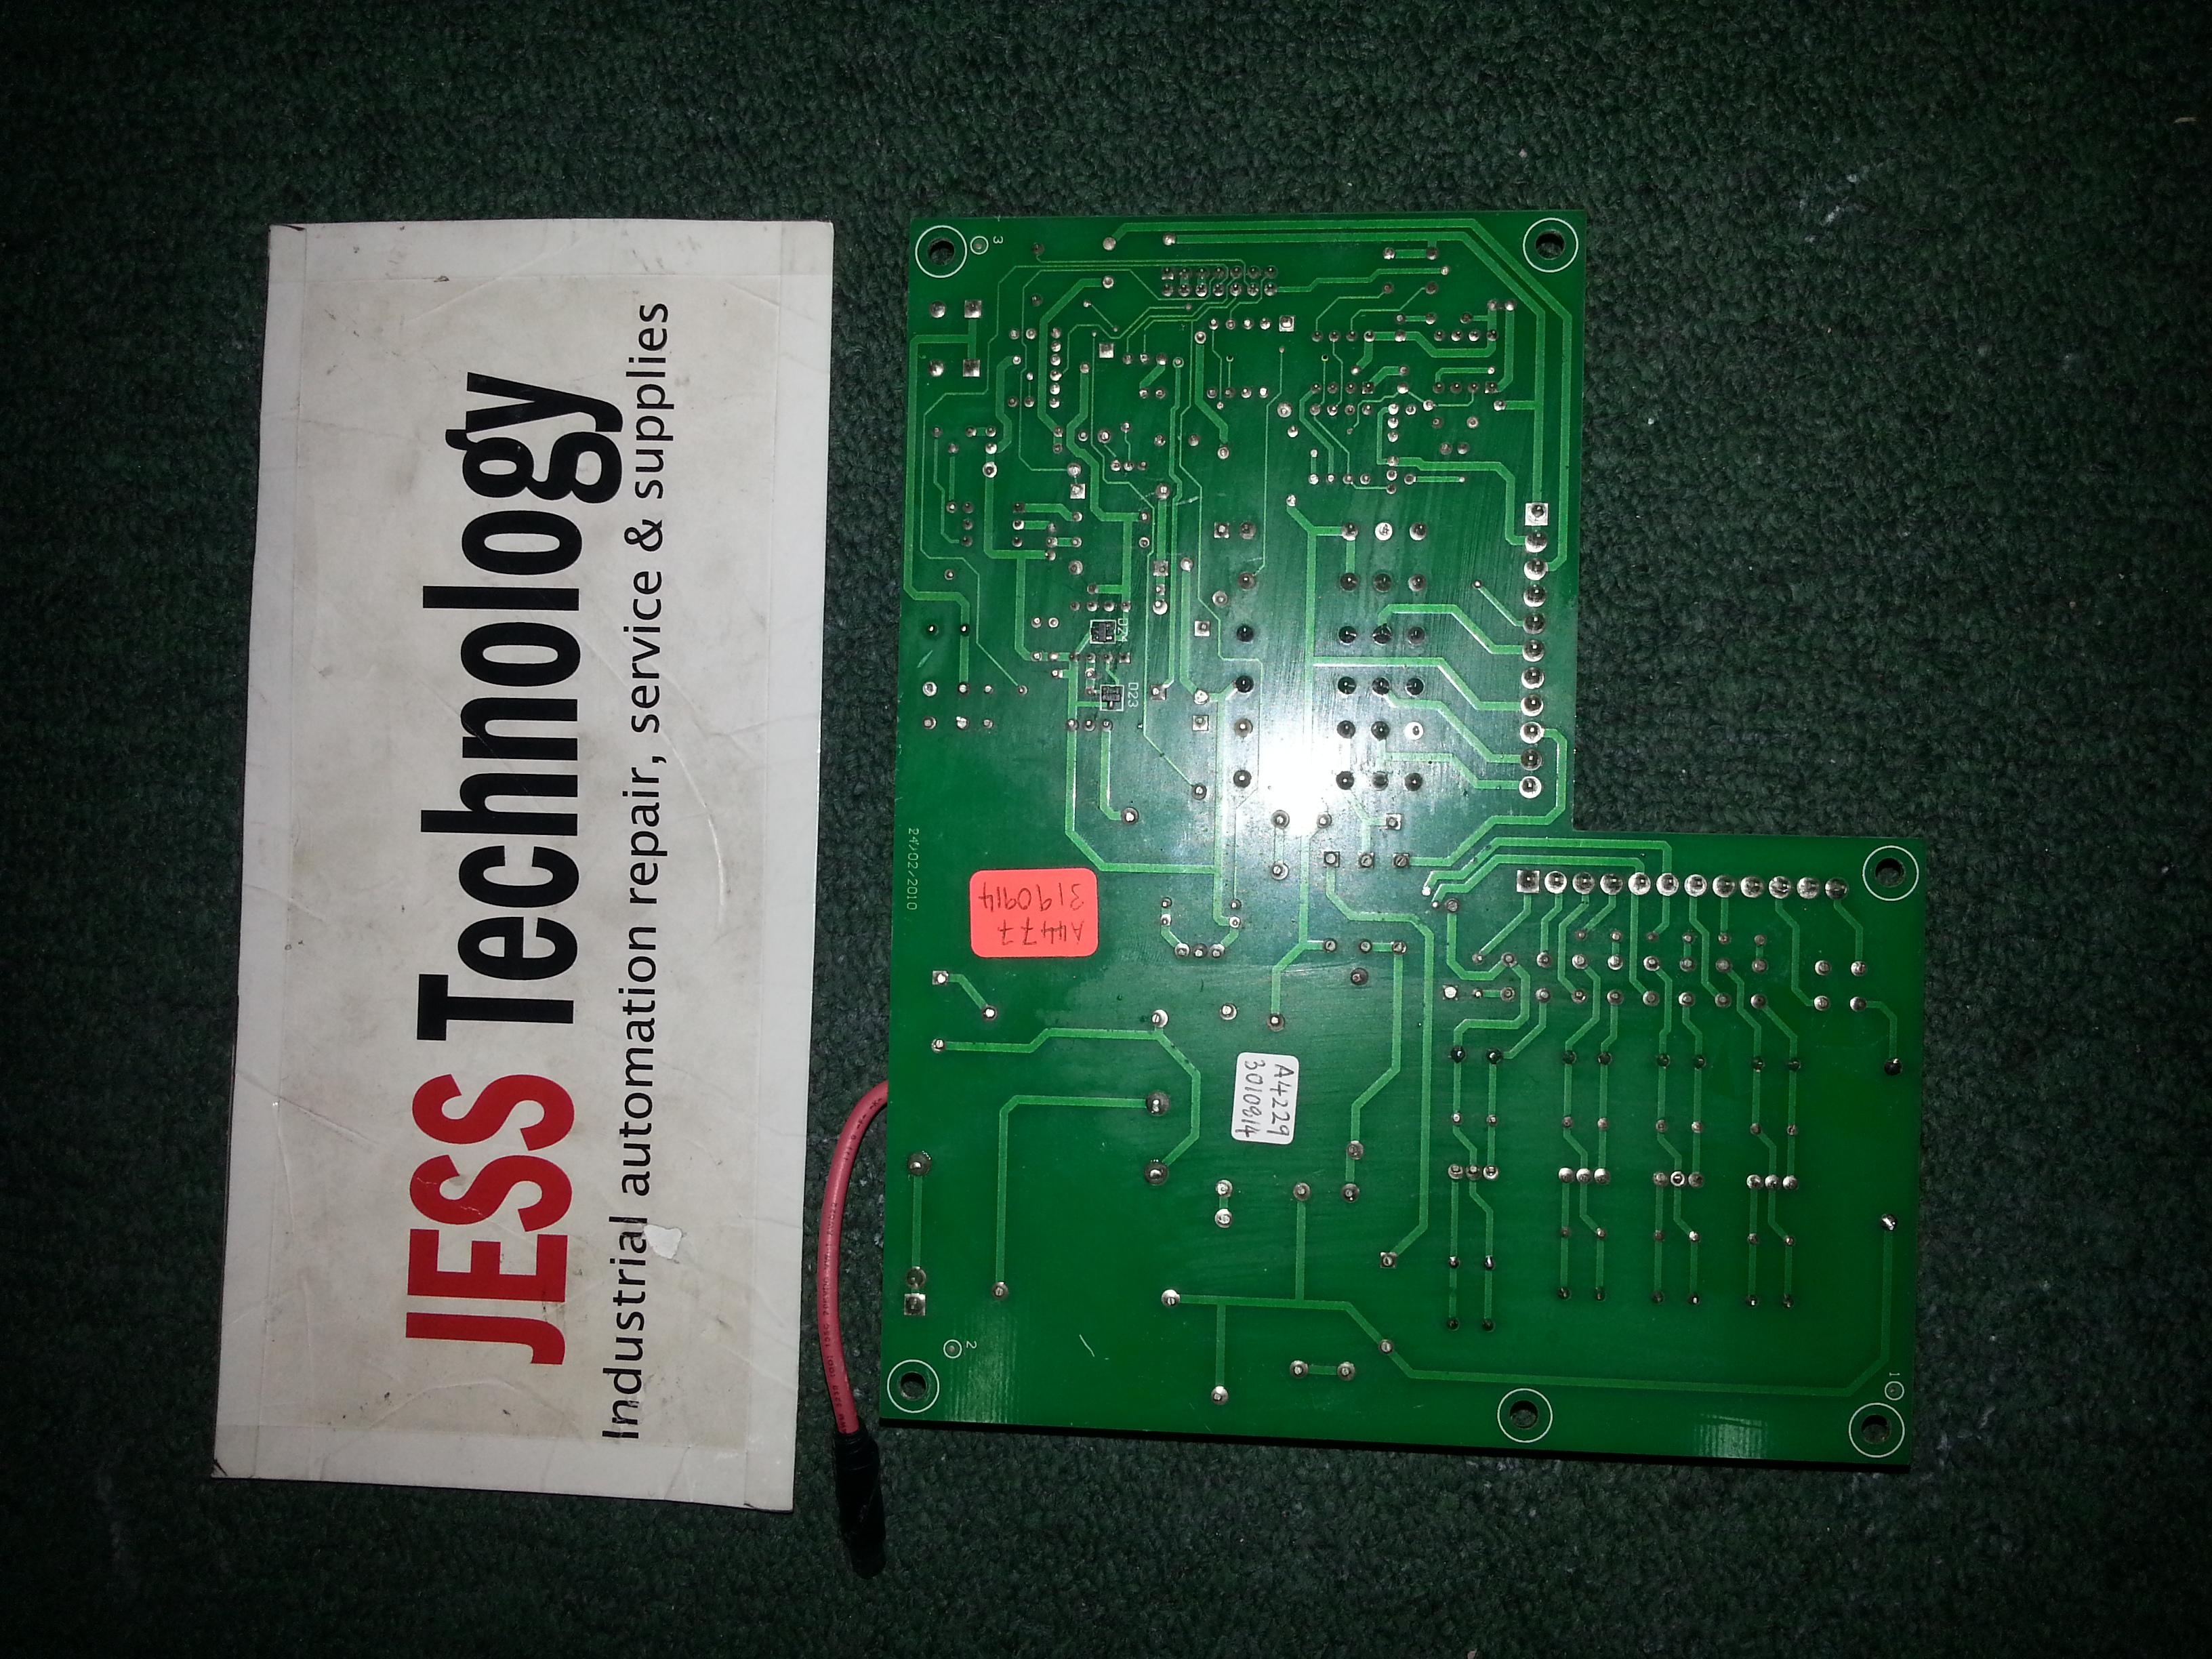 Repair V10-2023 REV-B EVCO PCB BOARD in Malaysia, Singapore, Thailand, Indonesia